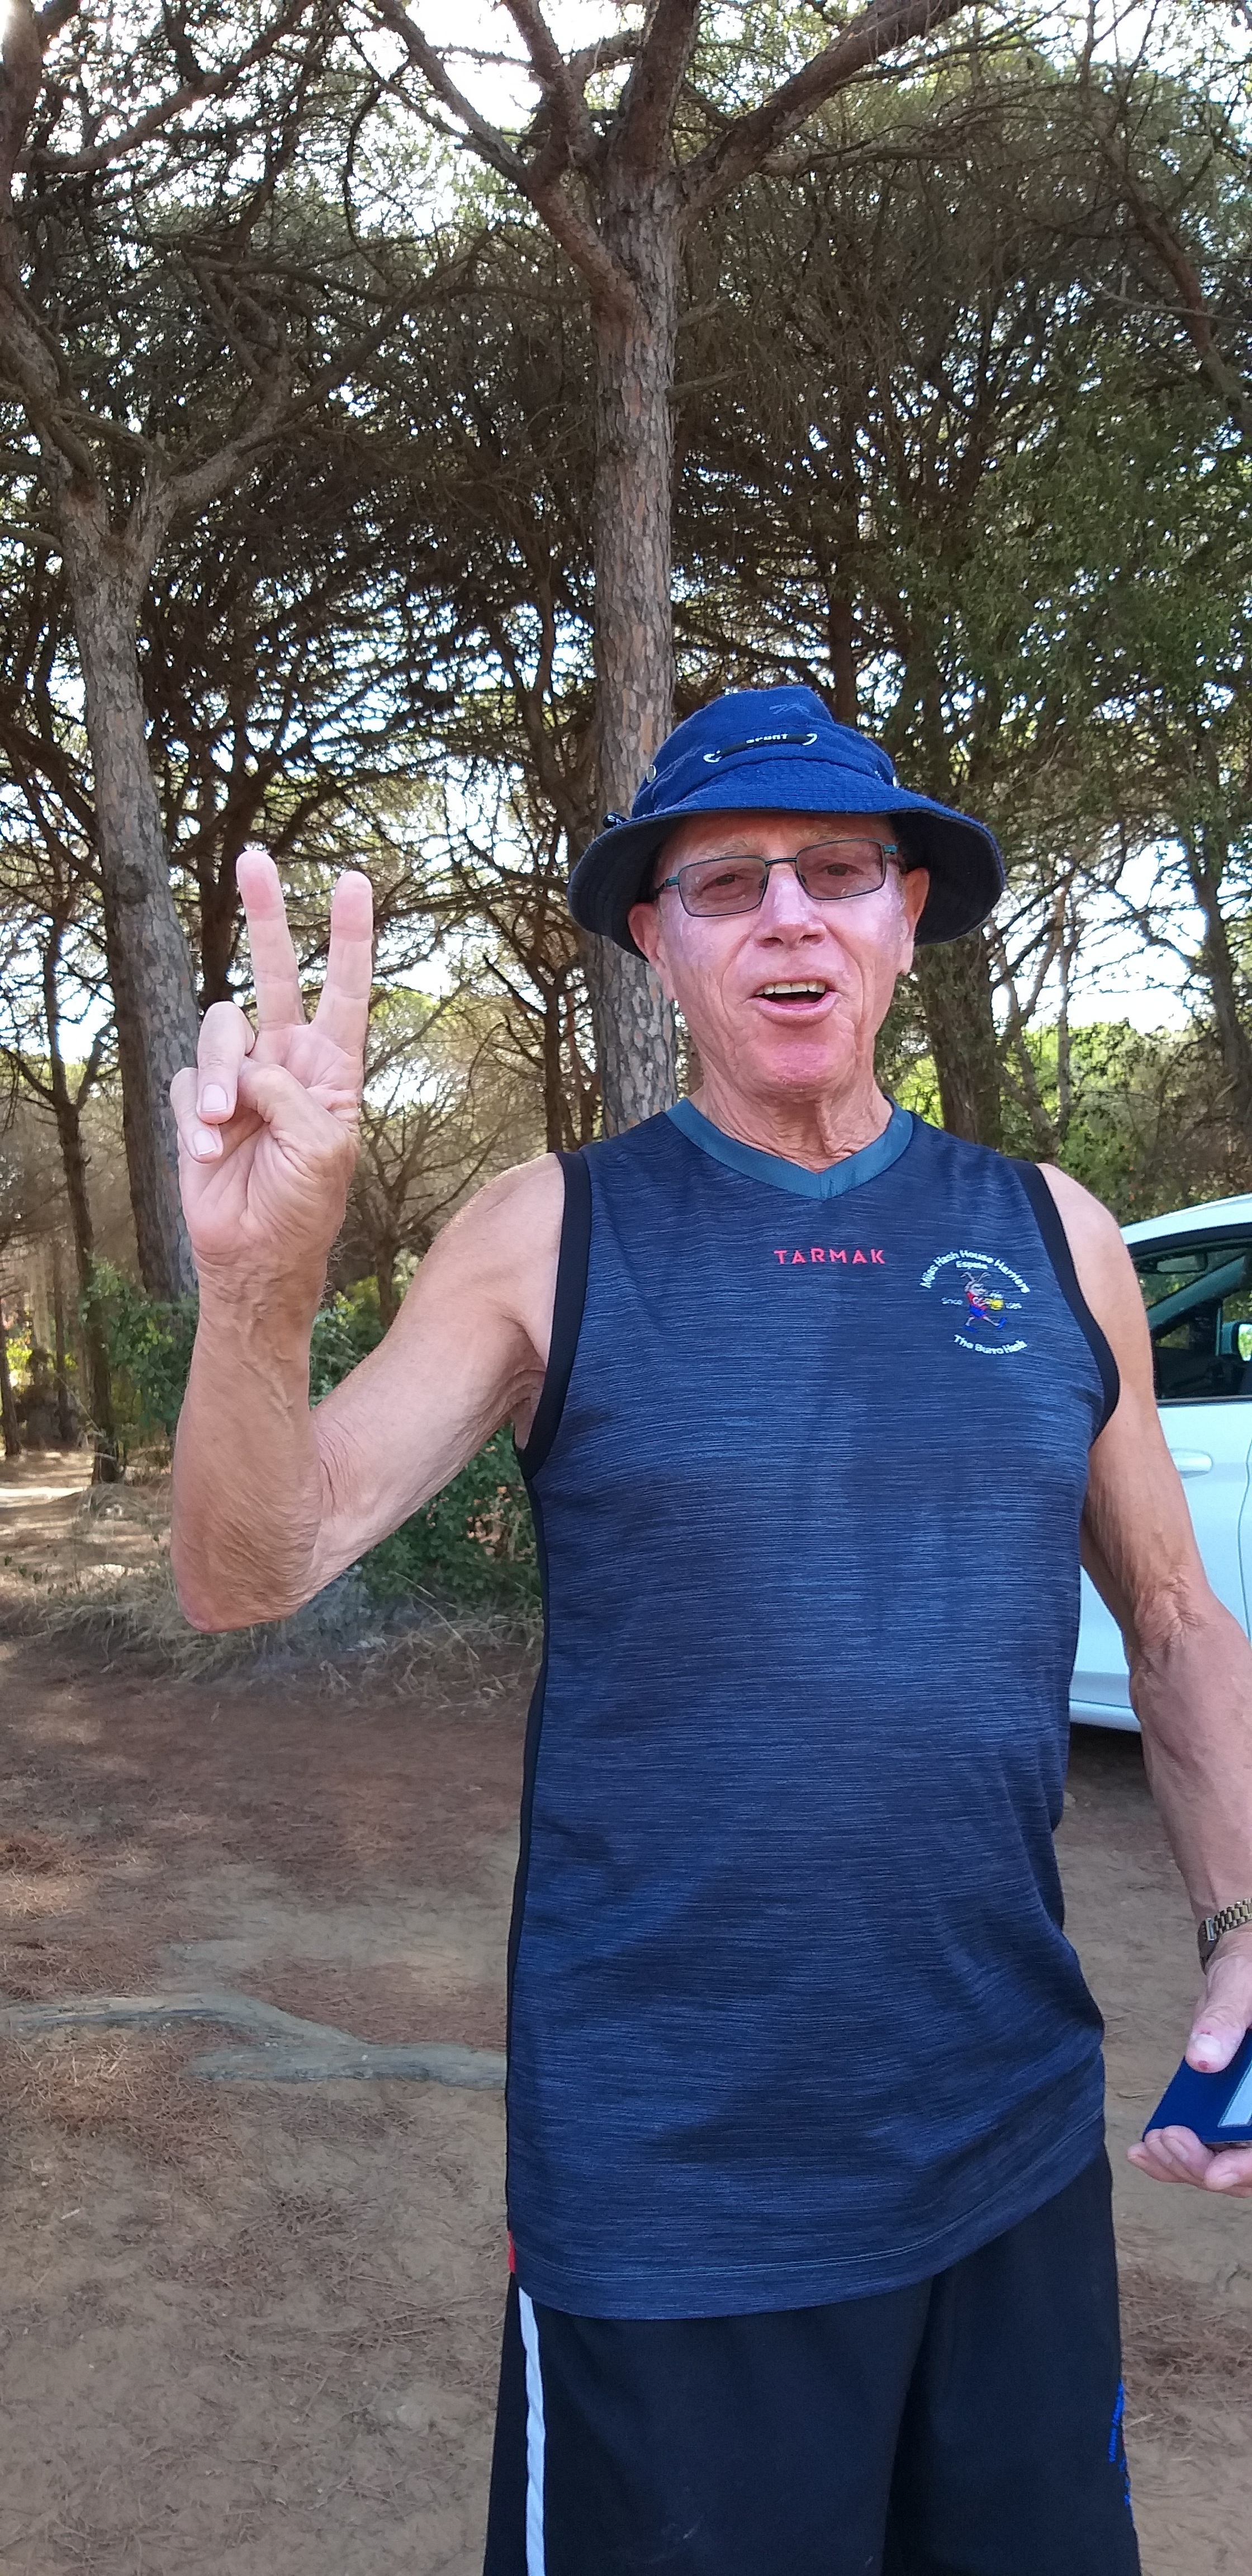 Hash Flash - olden Cascade - Run 1651 - 04 Aug 2019 - Photo 5.jpg